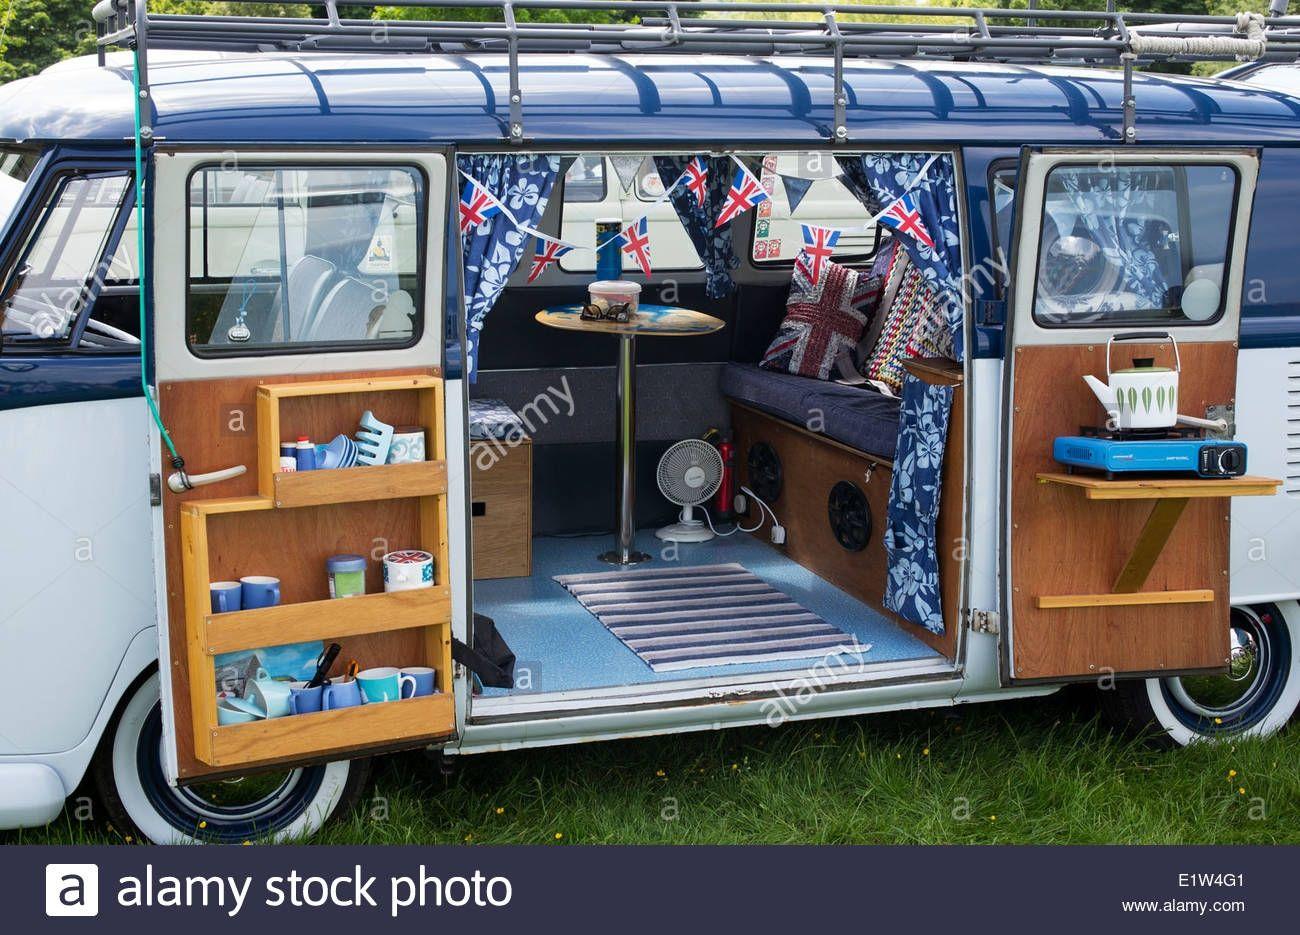 30 Inspiration Photo Of Volkswagen Camper Interior Camper And Travel Penitifashion Volkswagen Bus Interior Volkswagen Camper Volkswagen Camper Van